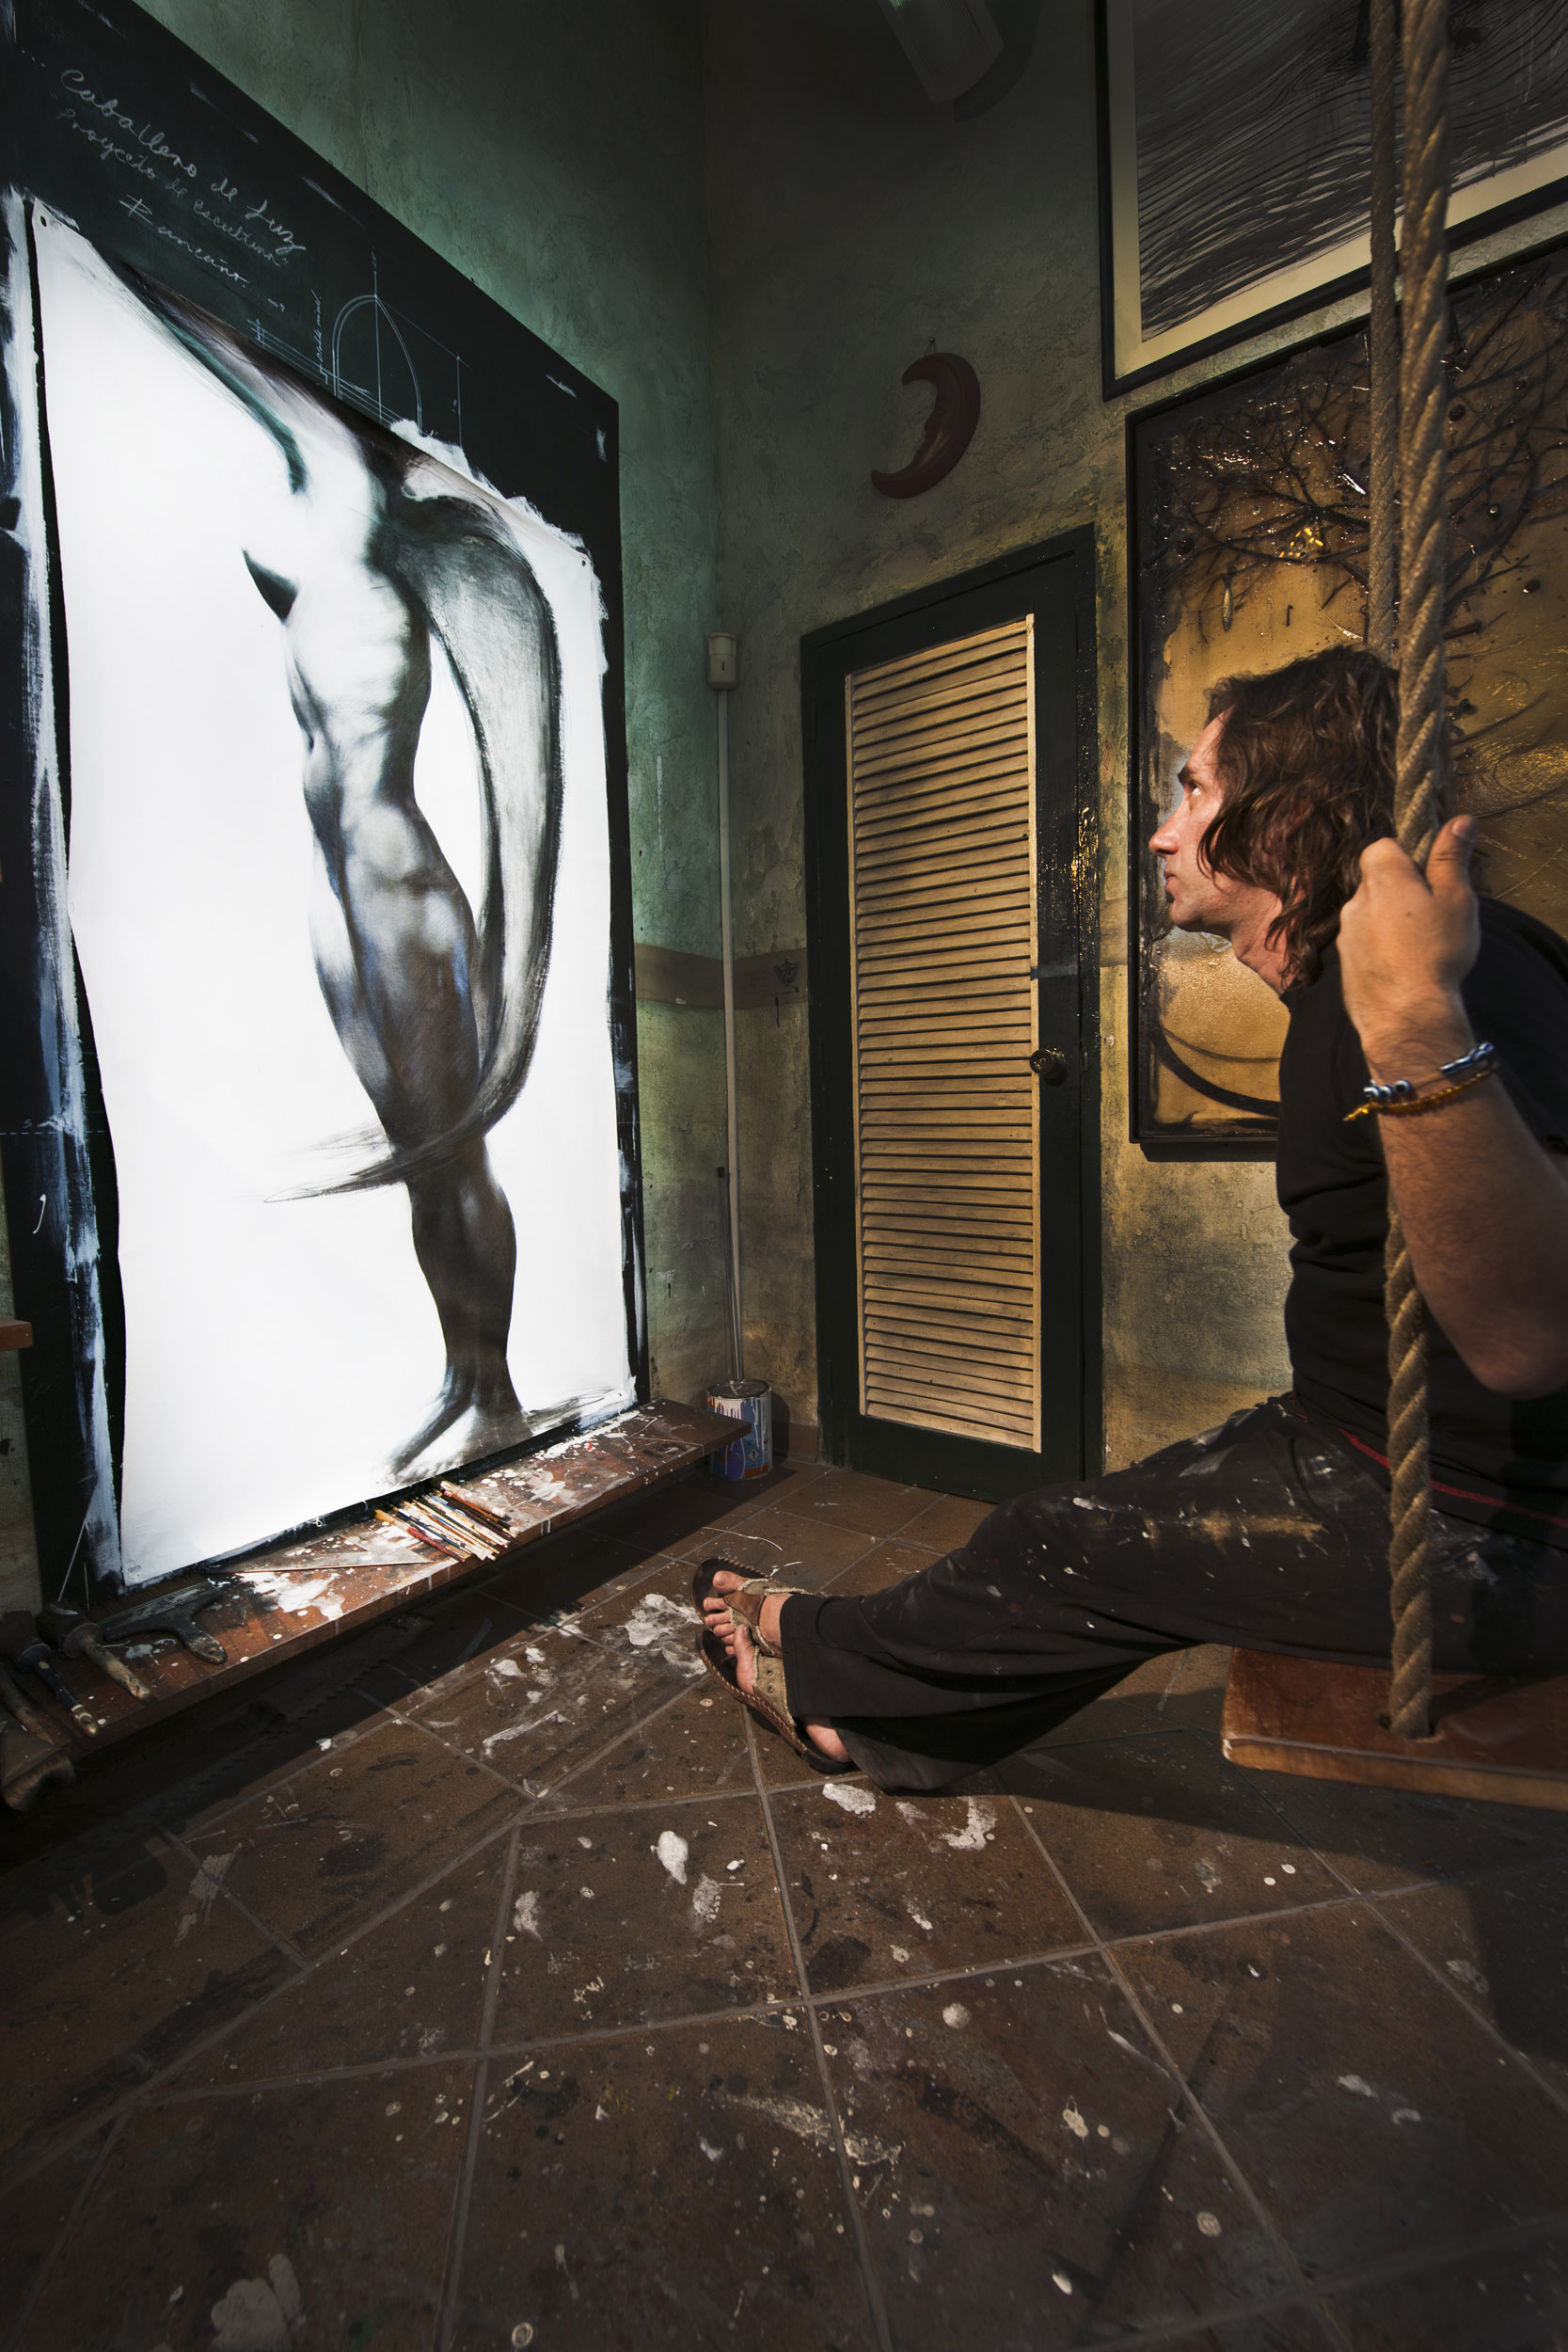 Ernesto Rancaño, painter - Illuminated Cuba - Hector Garrido, Aerial and human photography